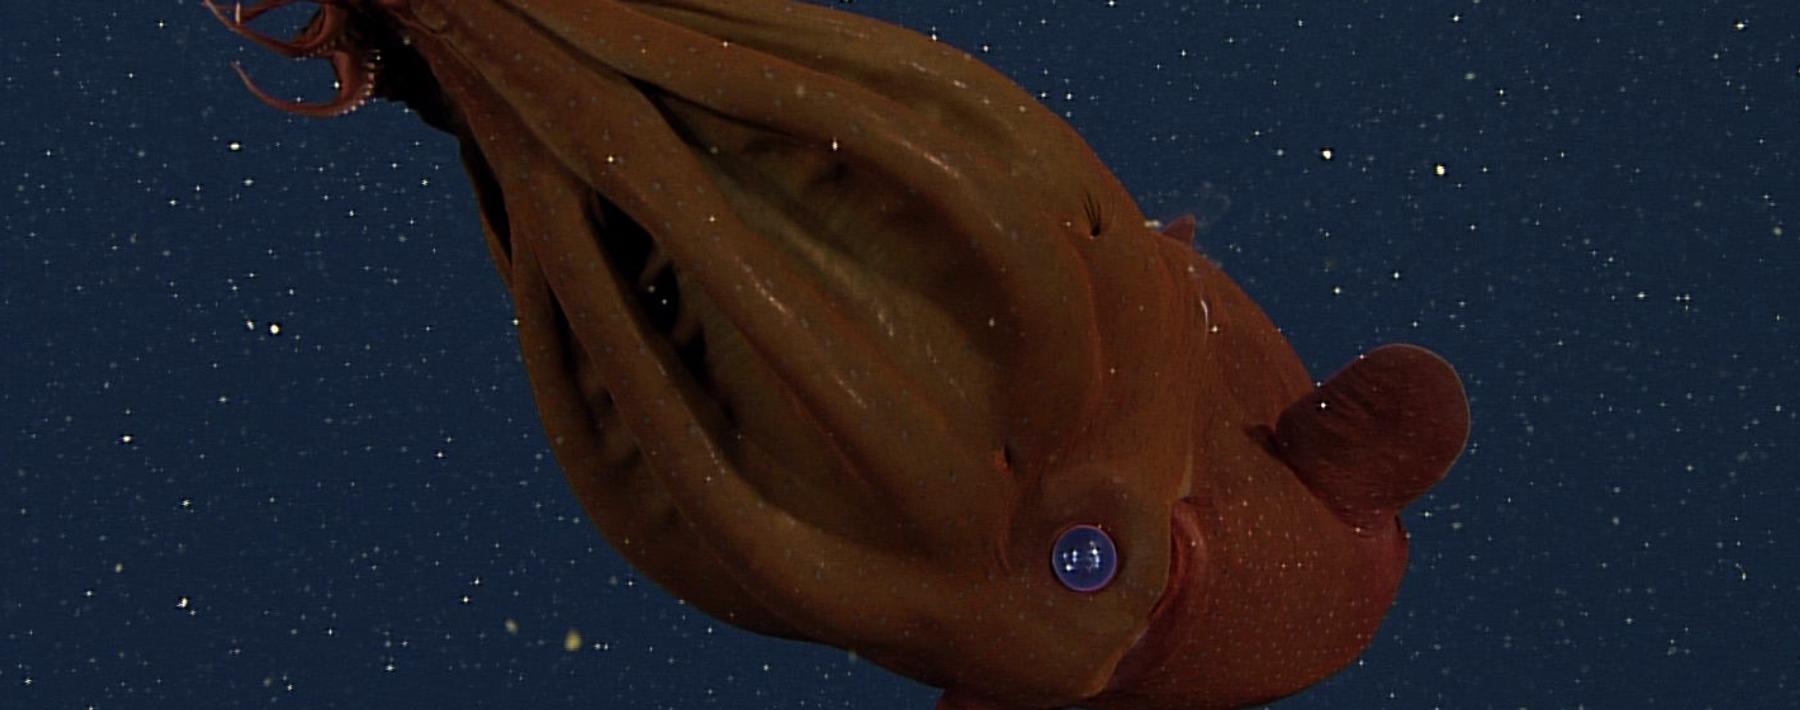 Image of the Day: Vampire Squid